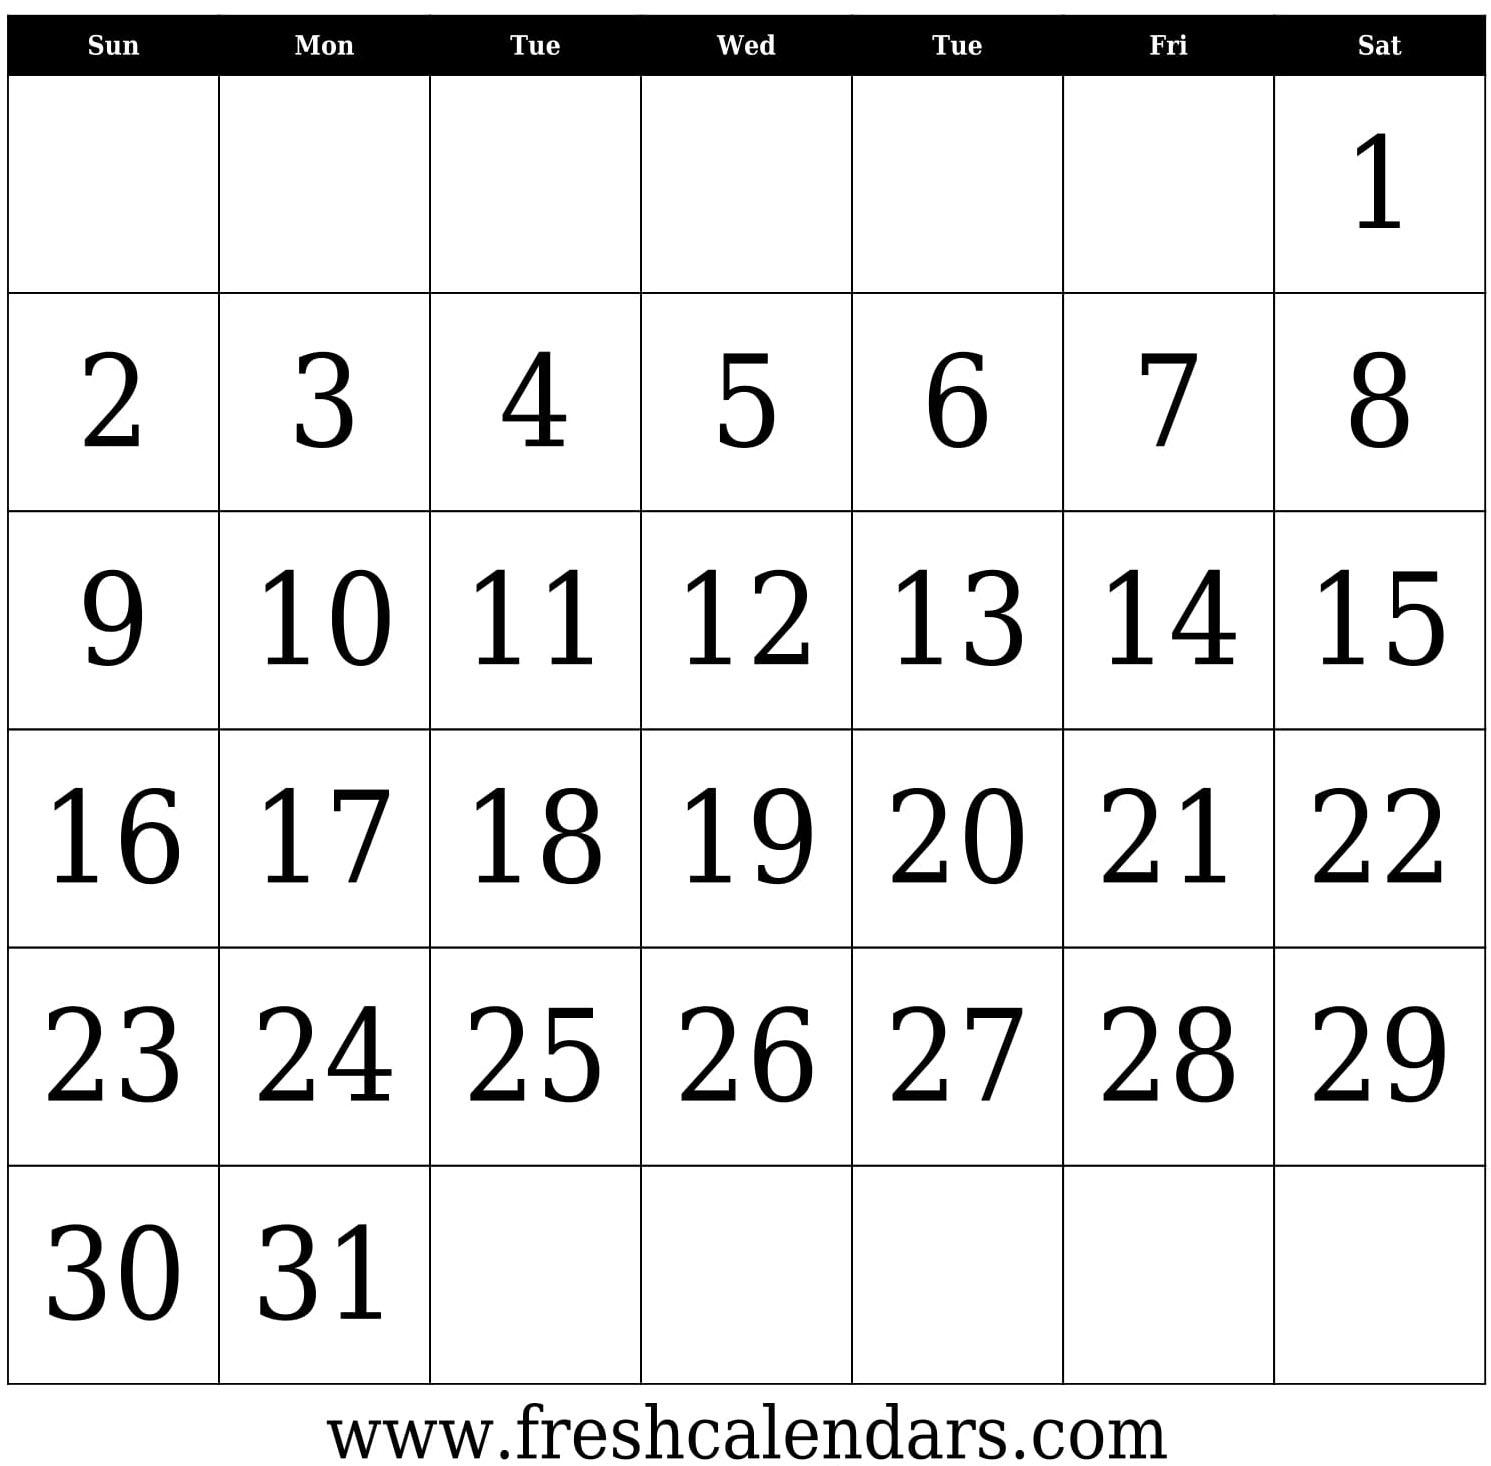 2020-2021 Calendar – Free Printable Two-Year Word Calendars 2020